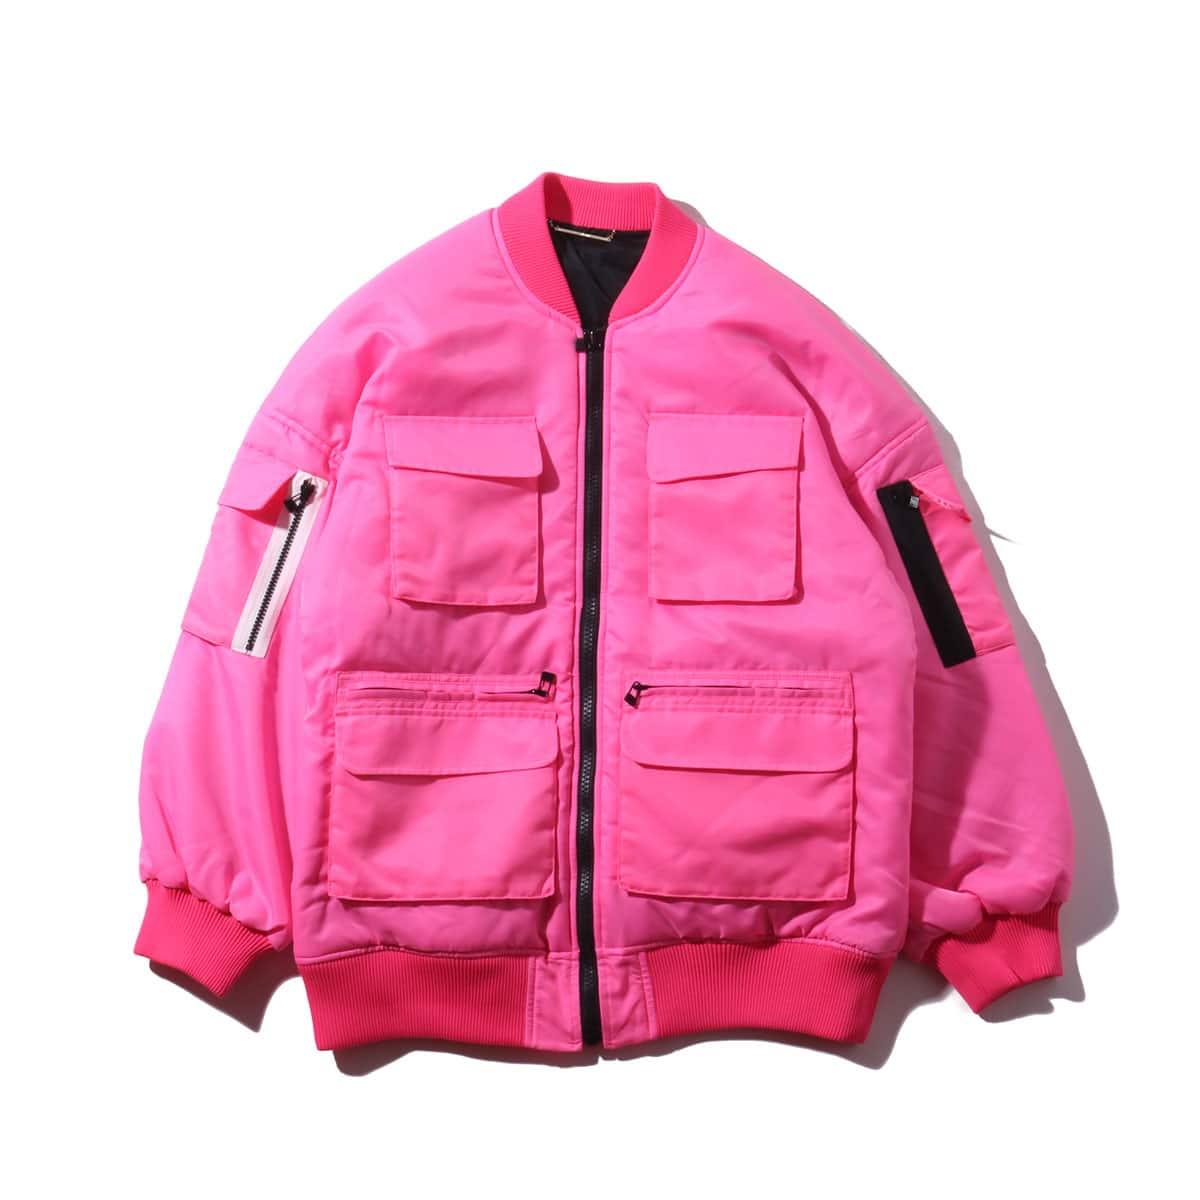 atmos pink フィッシング ブルゾン PINK 19FA-I_photo_large